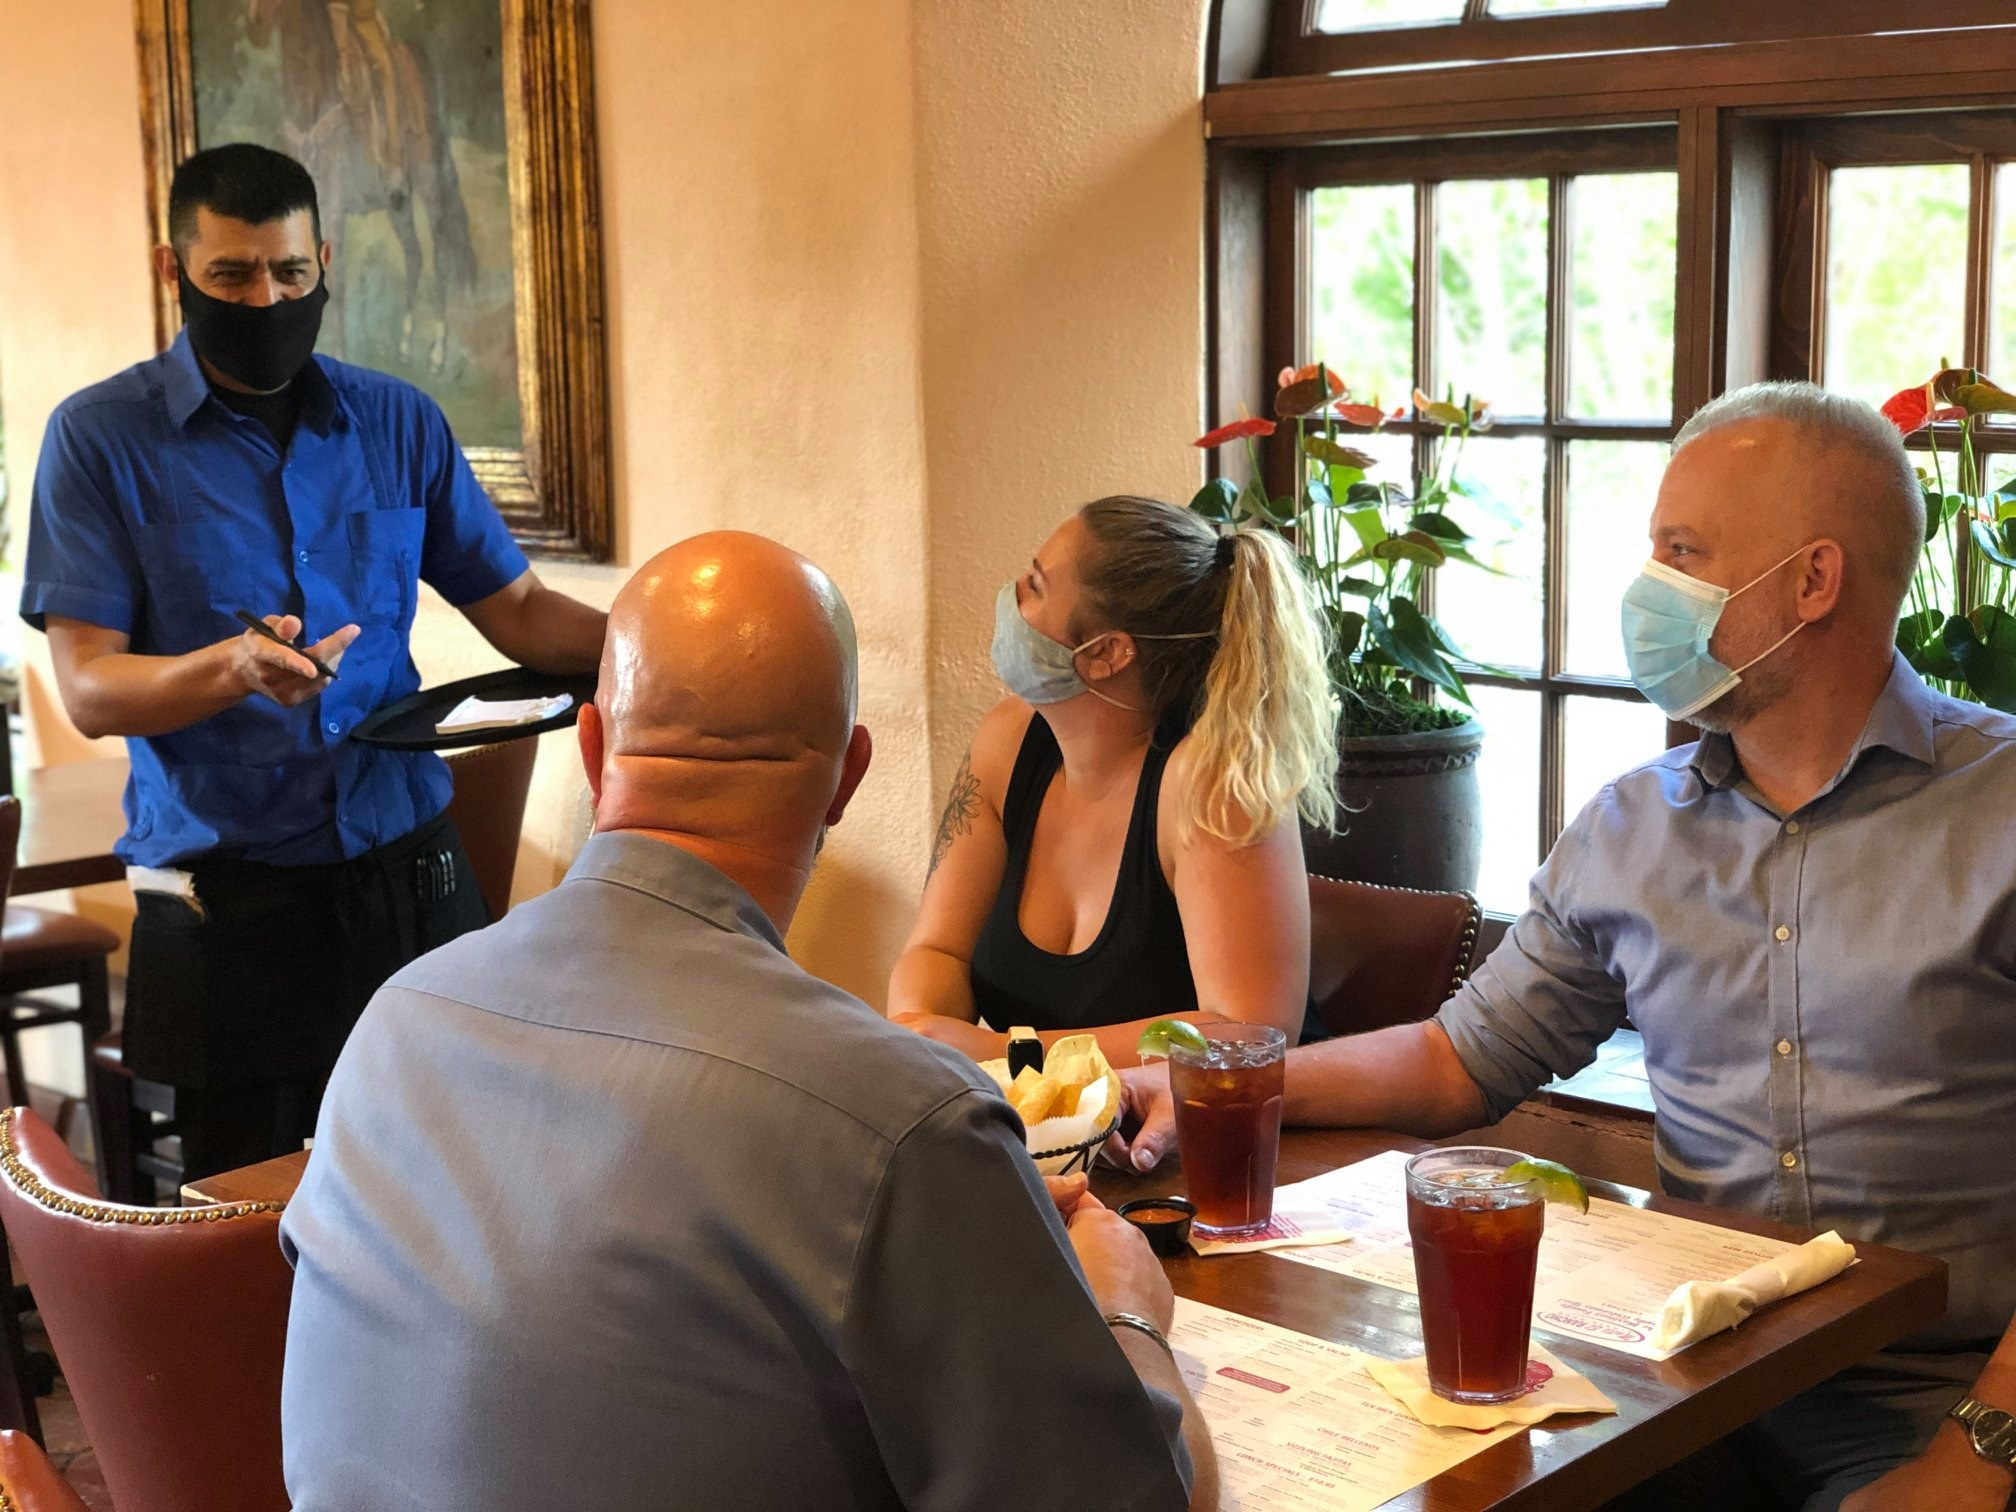 A server attending to a group dining at Matt's El Rancho